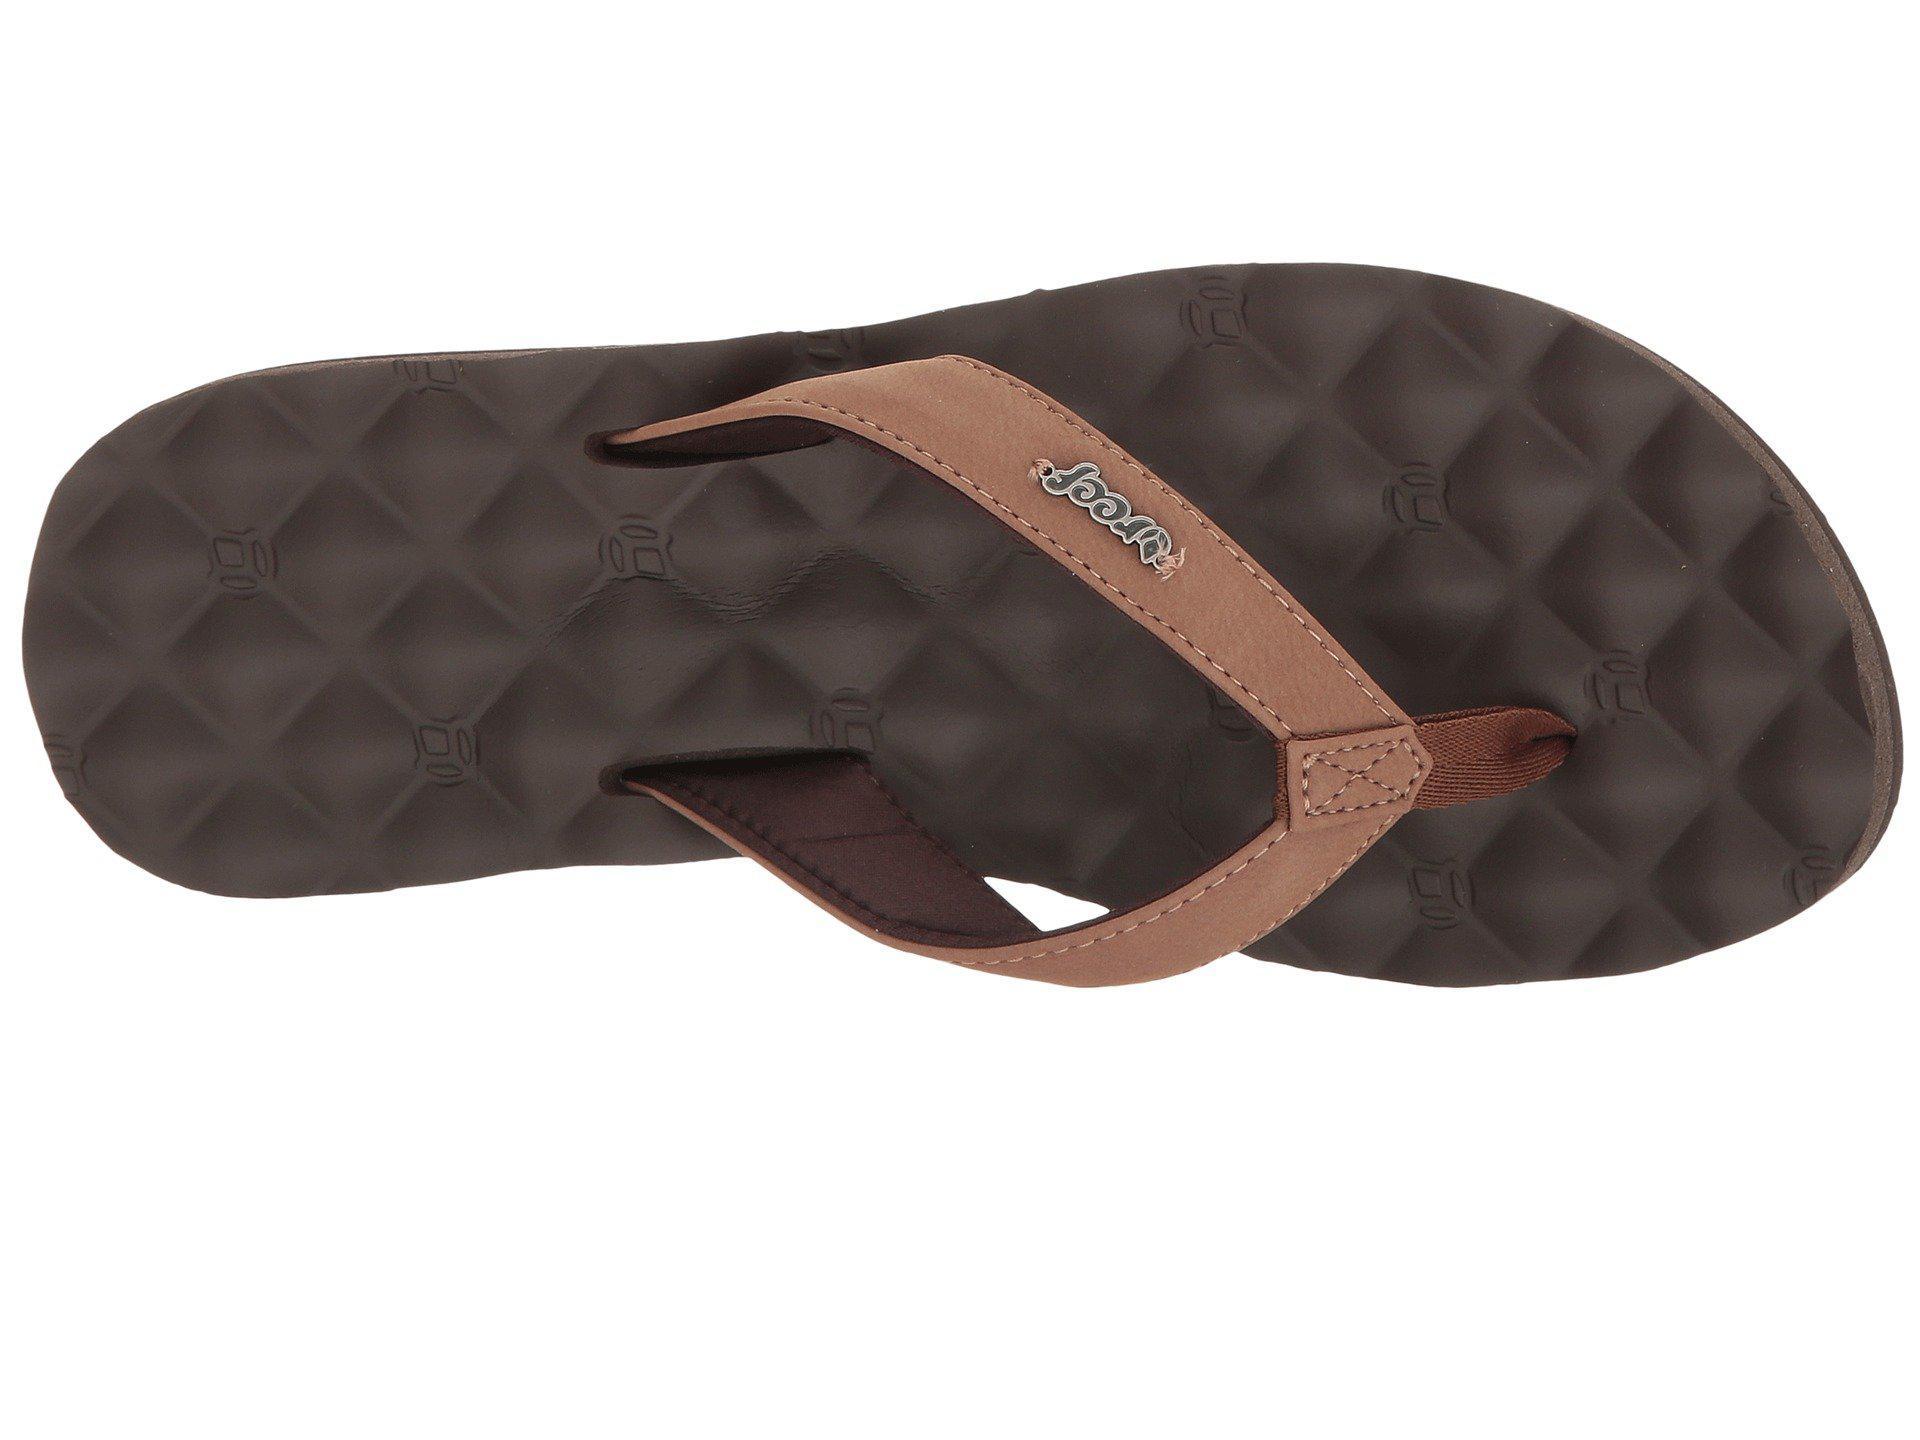 60b1239f9405 Reef - Brown Dreams (black black) Women s Sandals - Lyst. View fullscreen